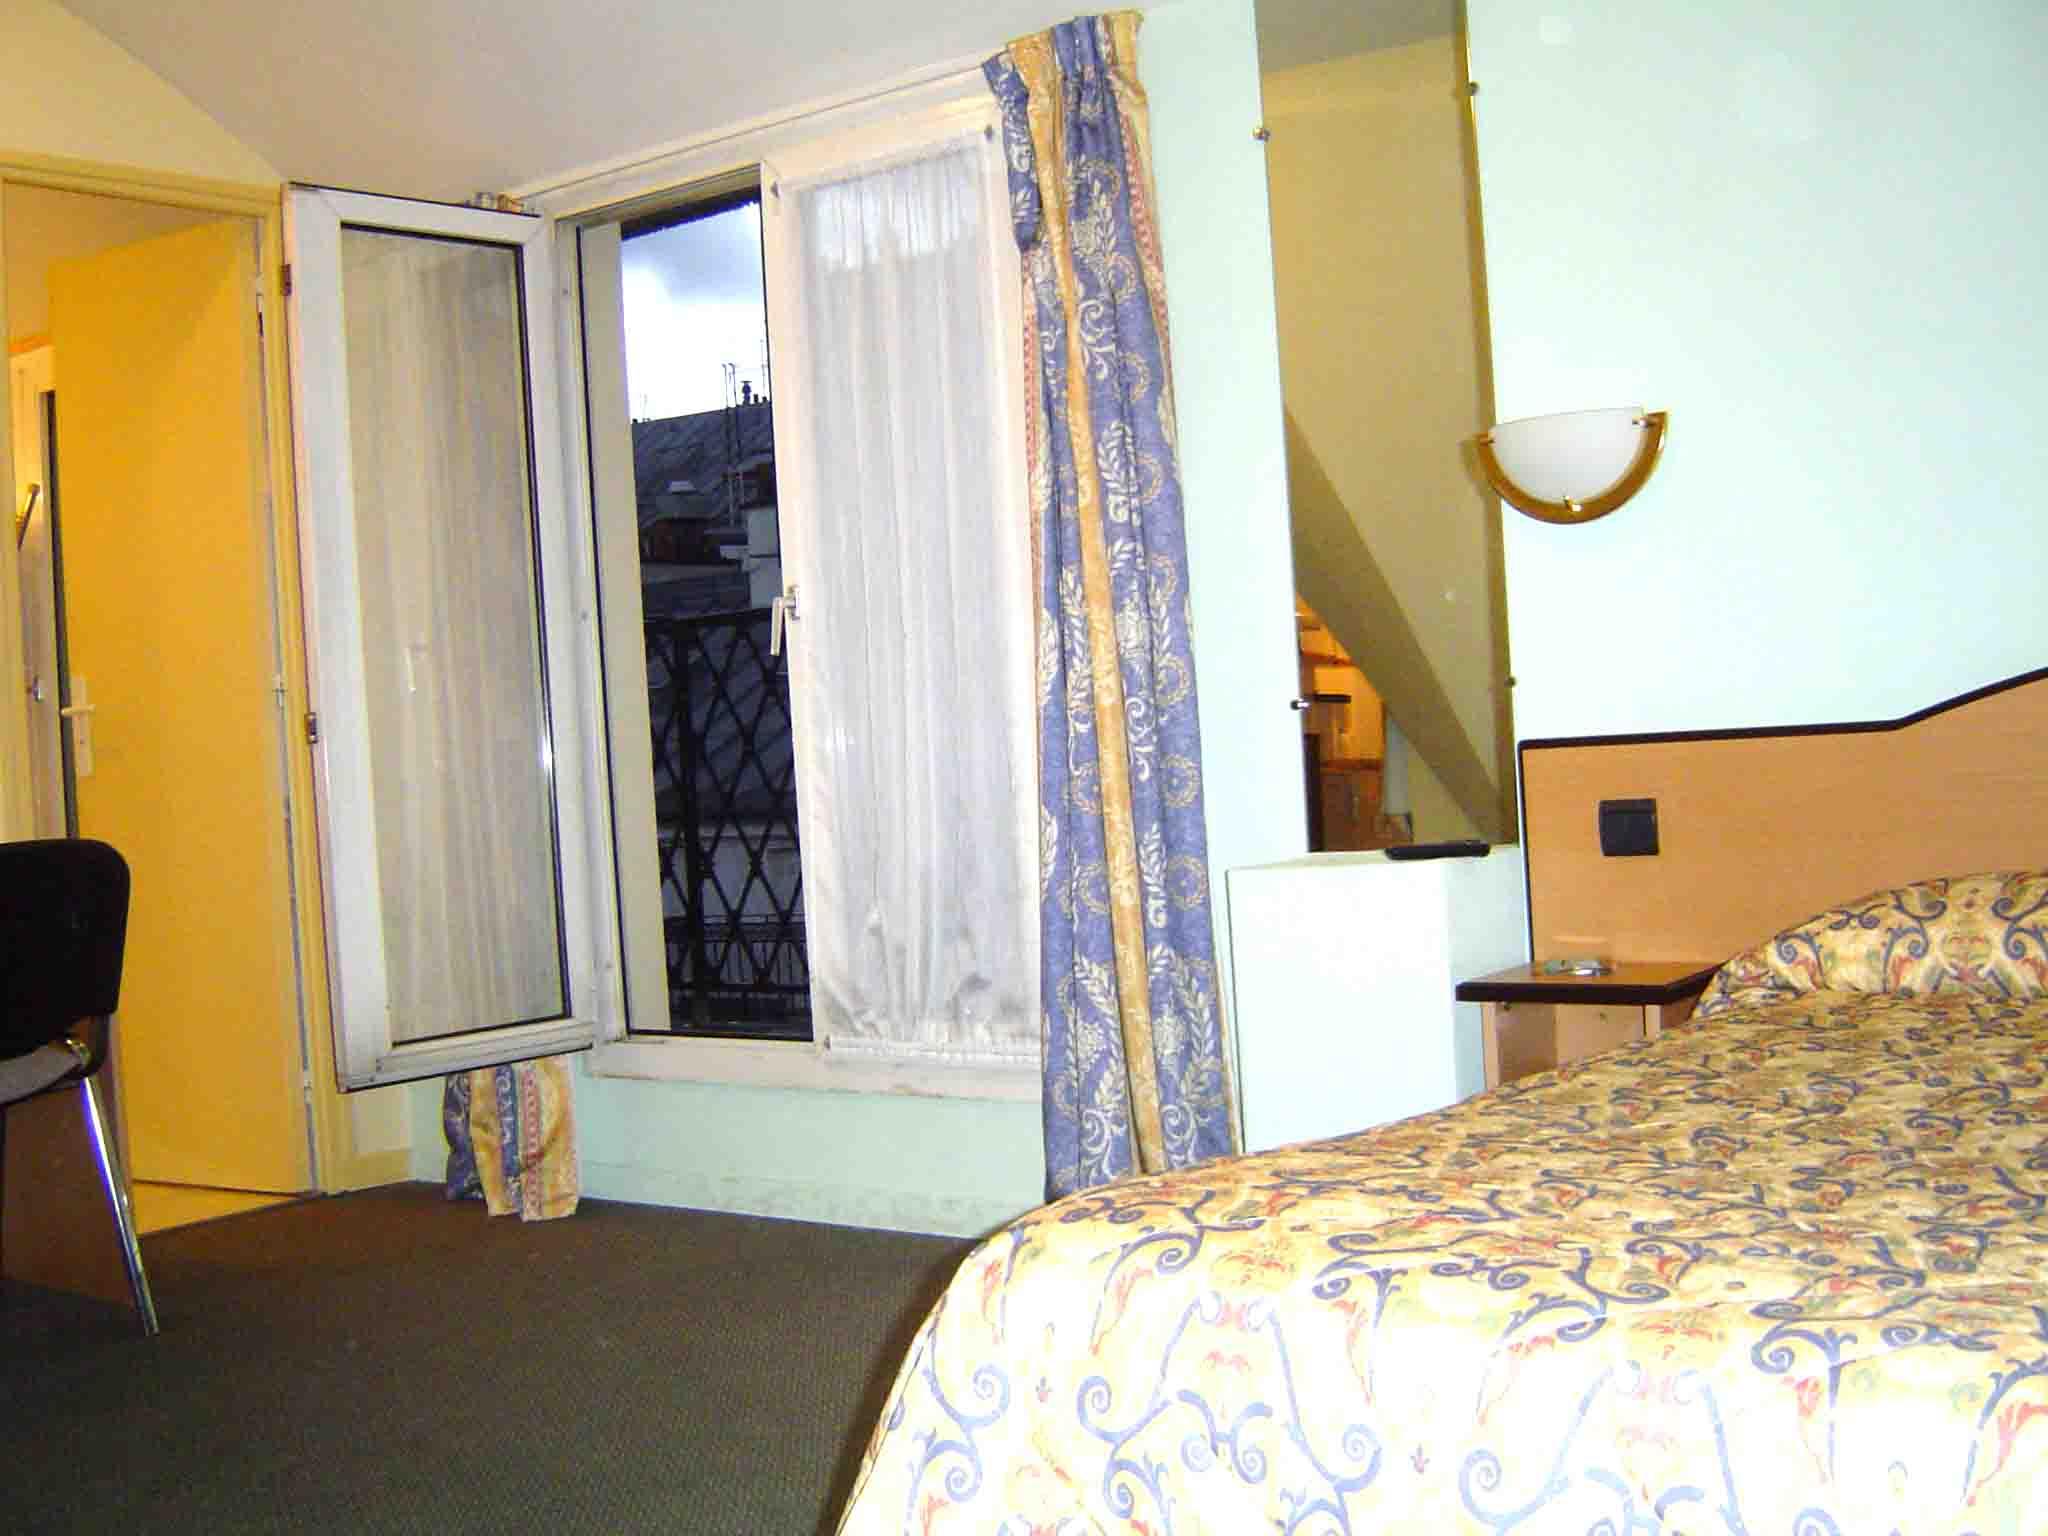 Appart 39 h tel for Appart hotel 0 paris